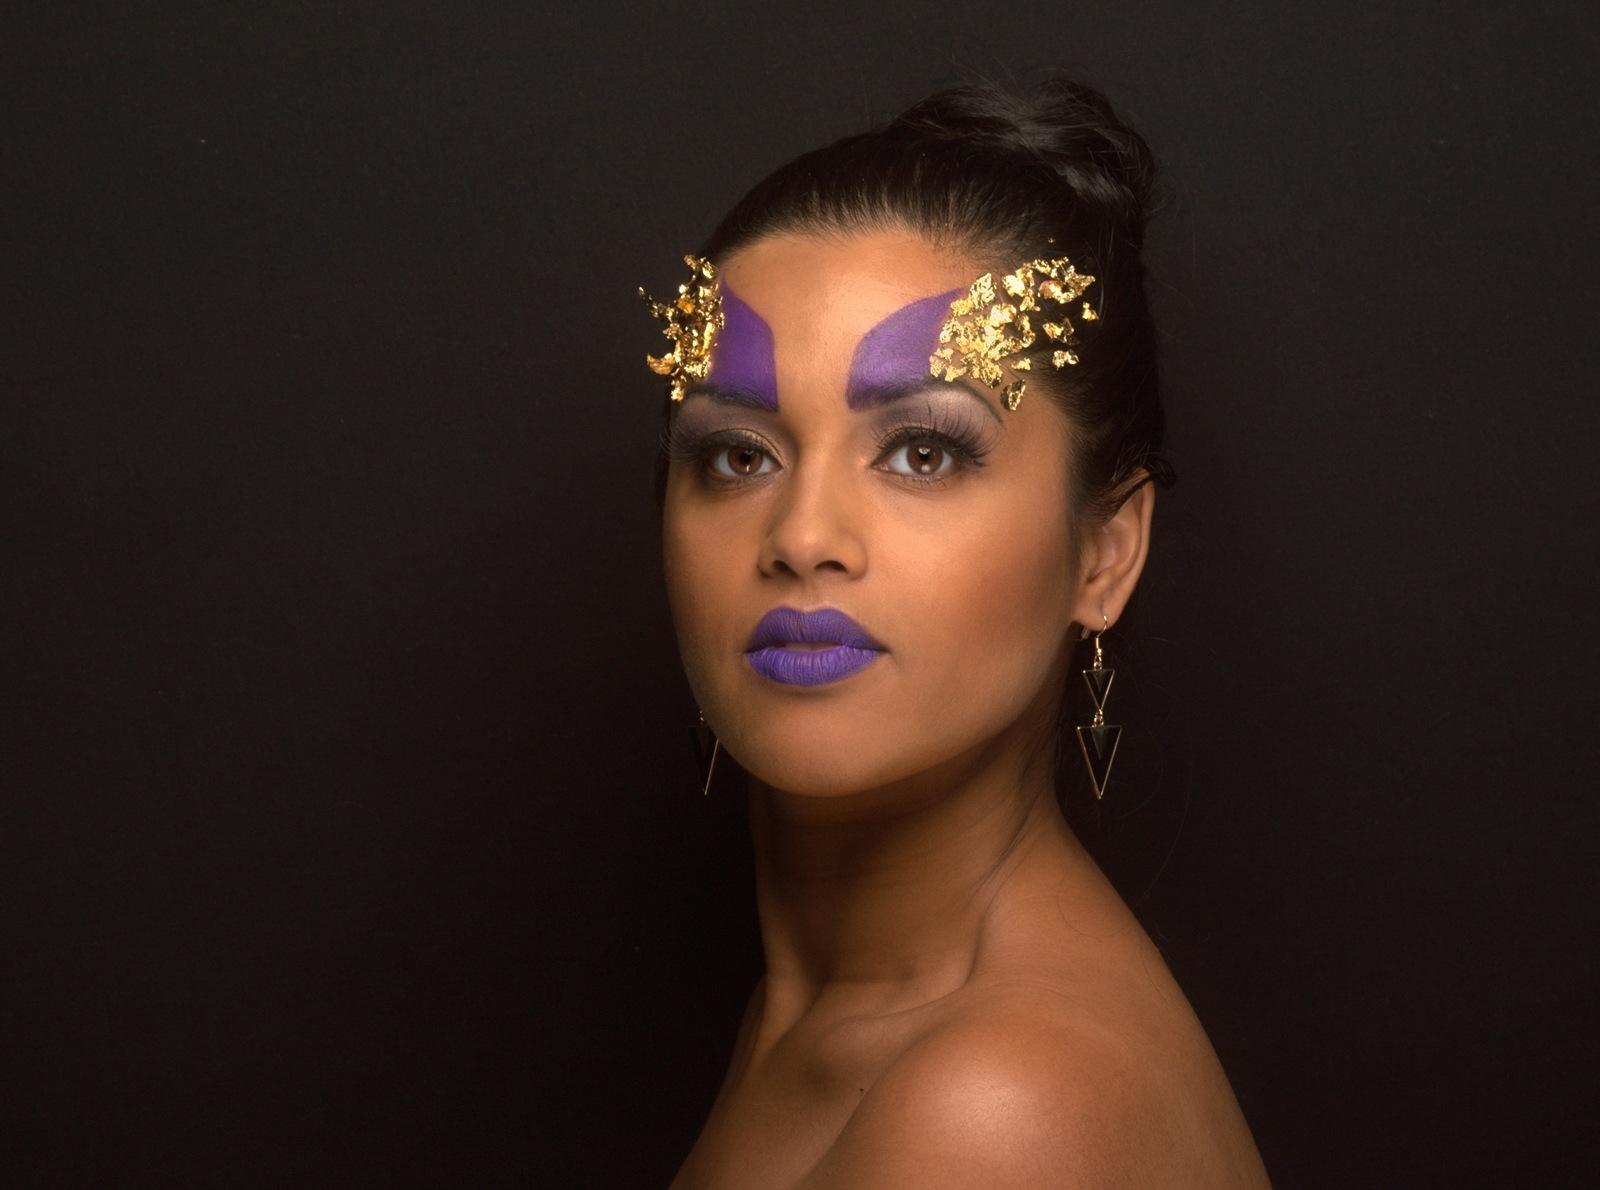 Extreme Make-up by EddyStekkinger